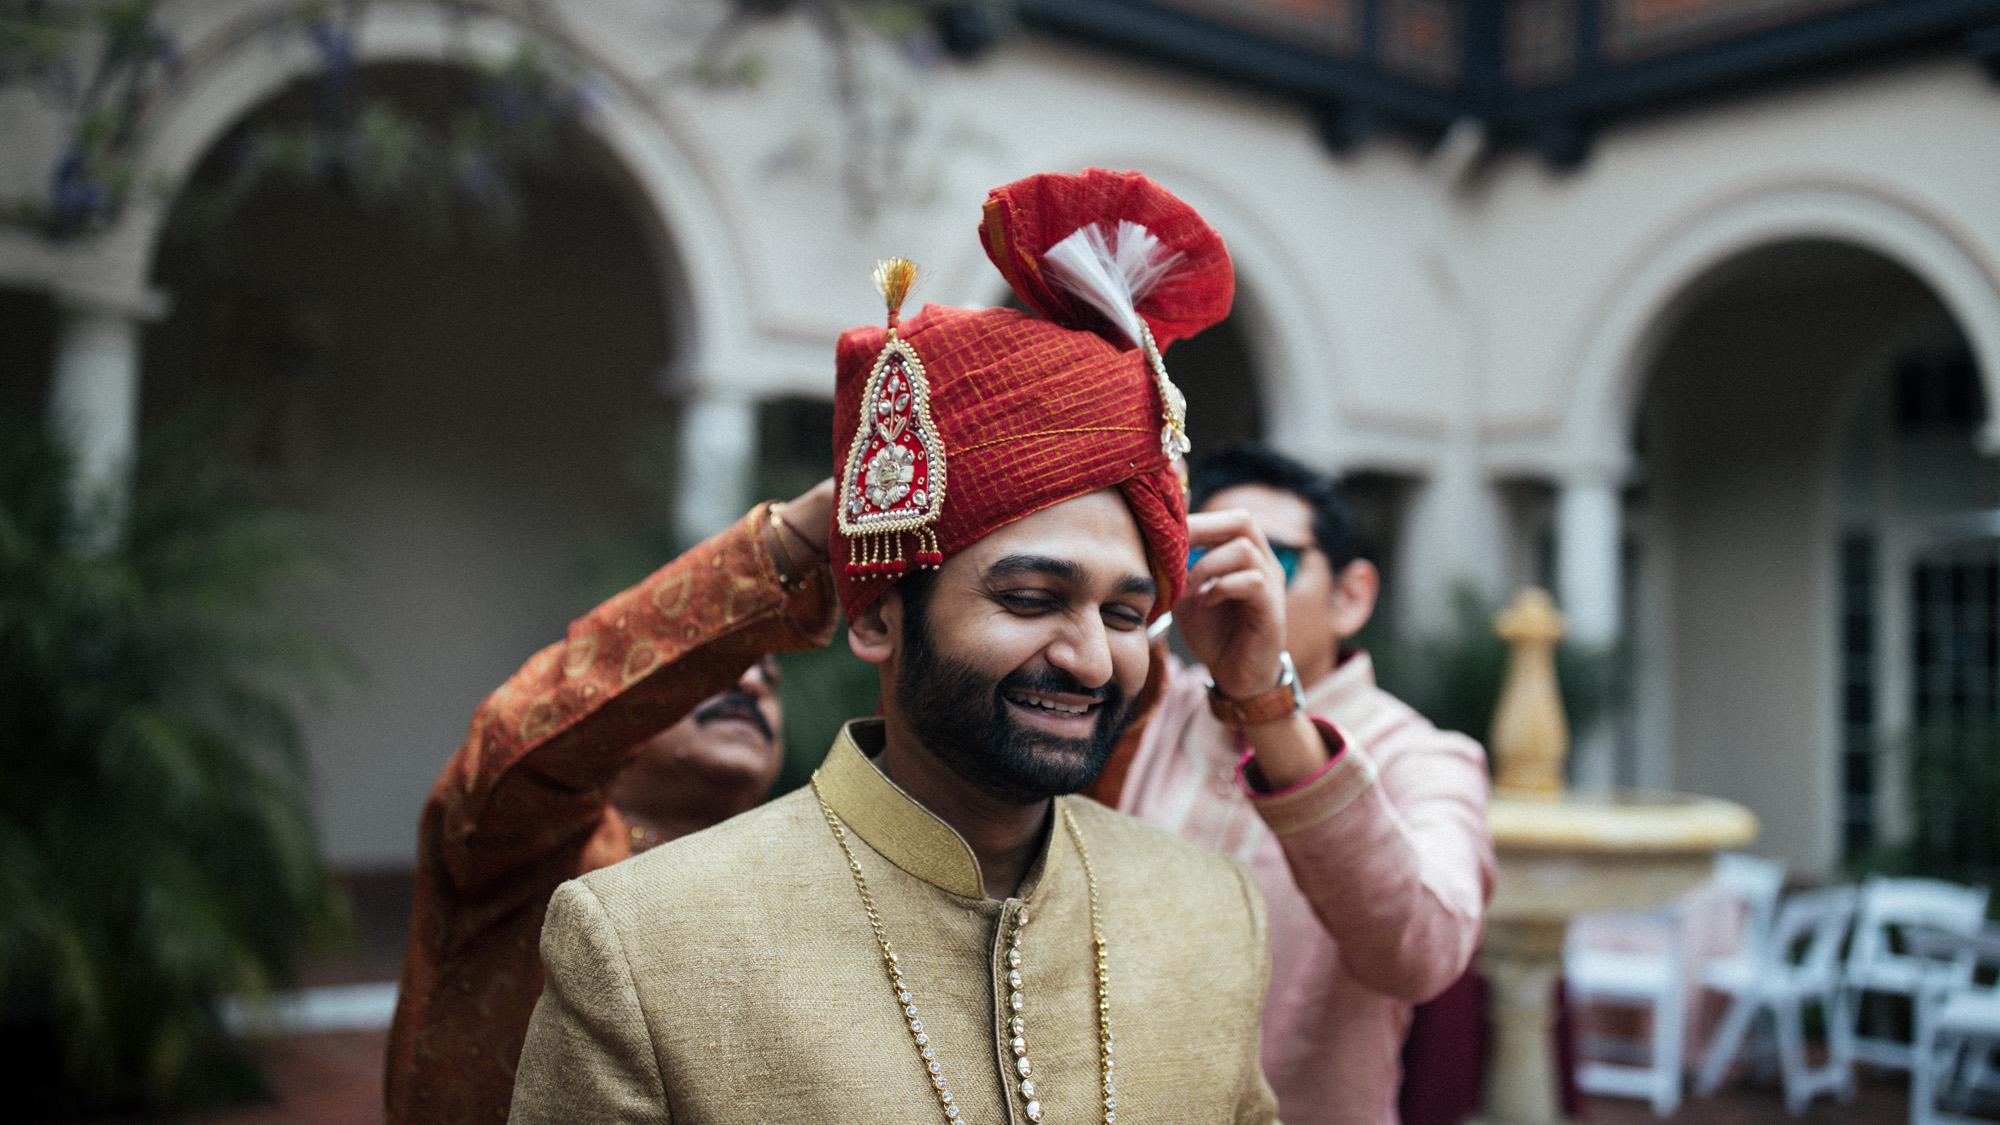 anu_maneesh_alec_vanderboom_Indian_wedding_photography-0063.jpg